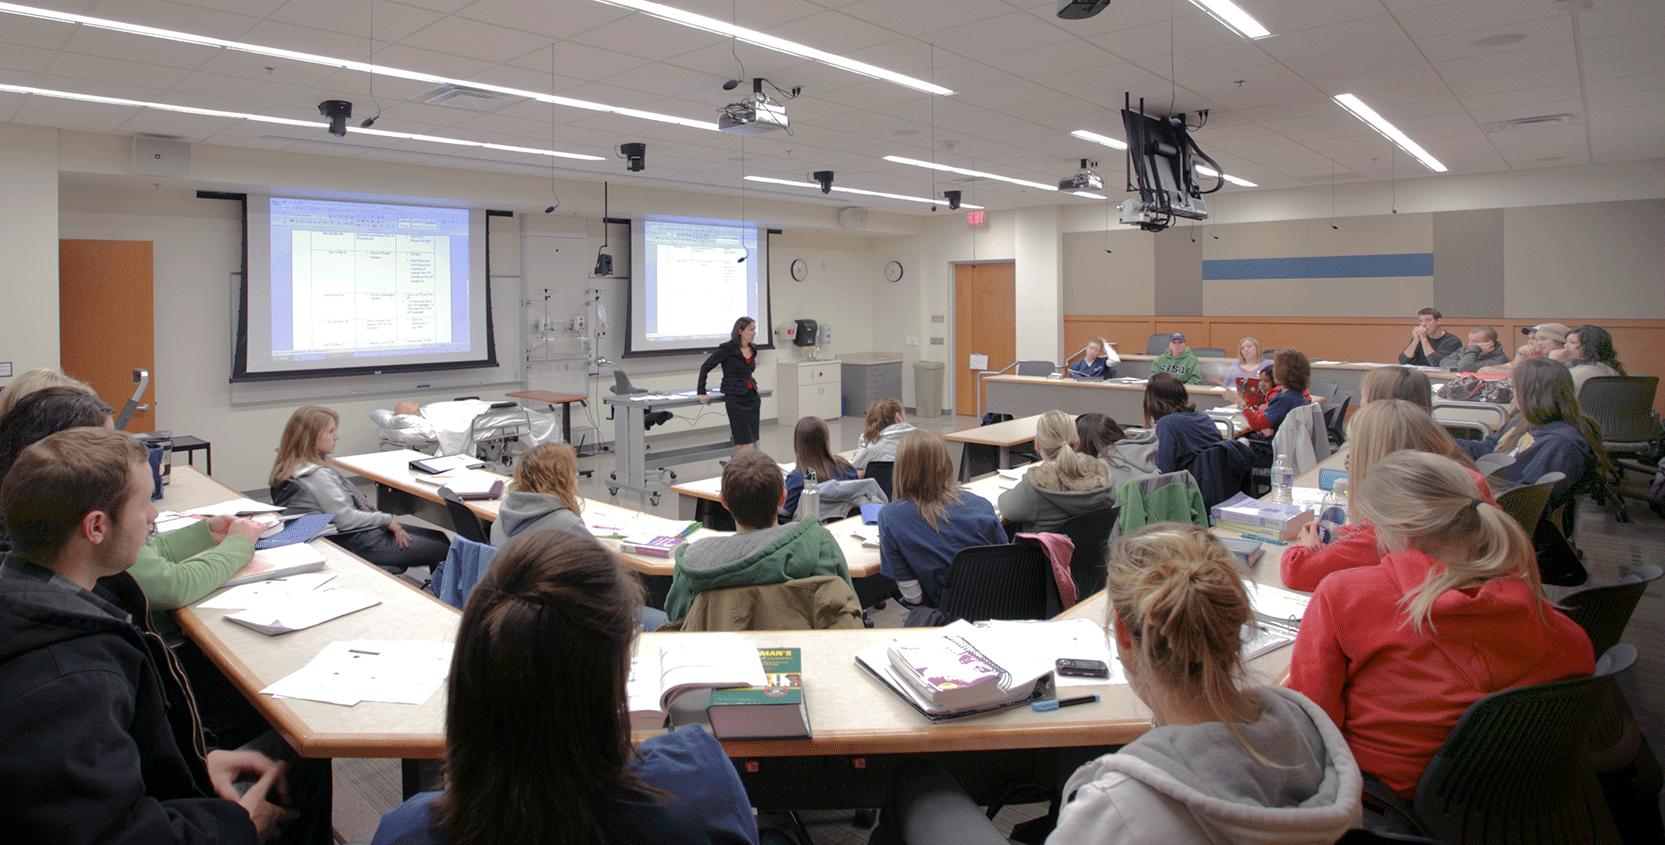 SVSU-CHHS-Classroom-2-1665x845